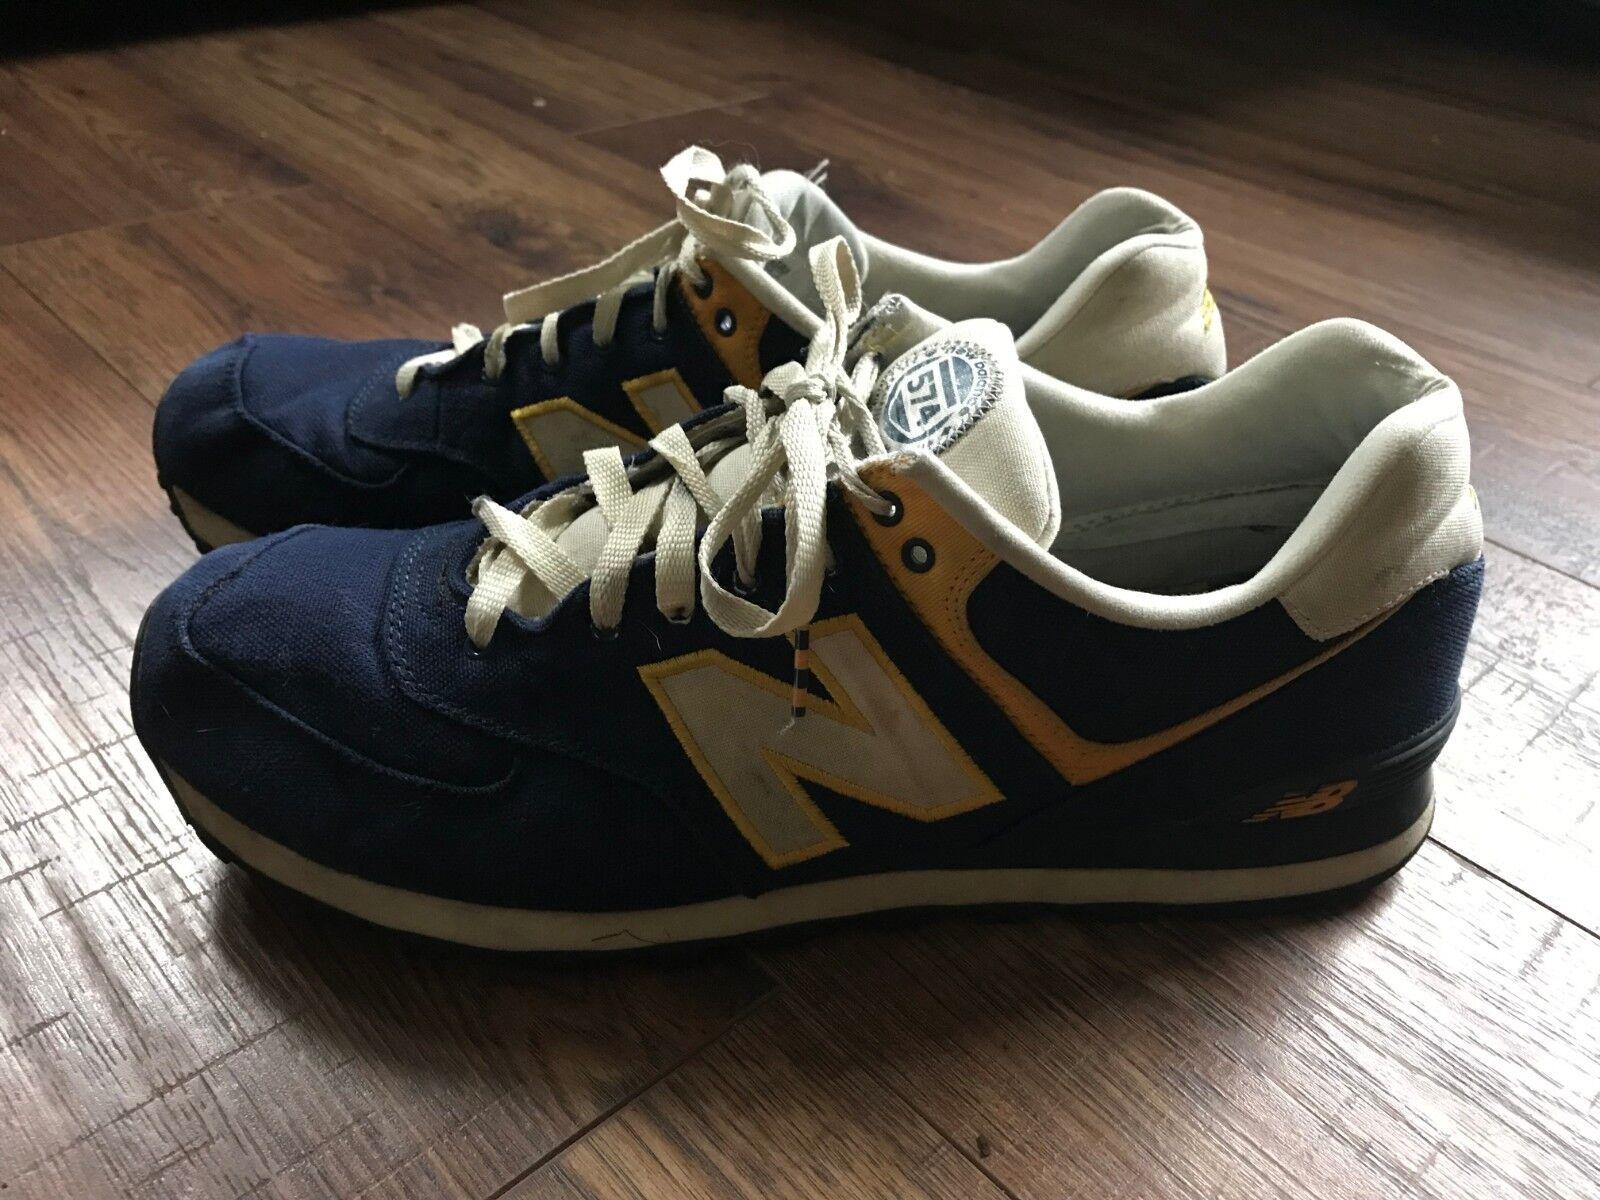 Men's NEW BALANCE 574 Retro Running Sneakers, Classics, bluee gold, Size 13